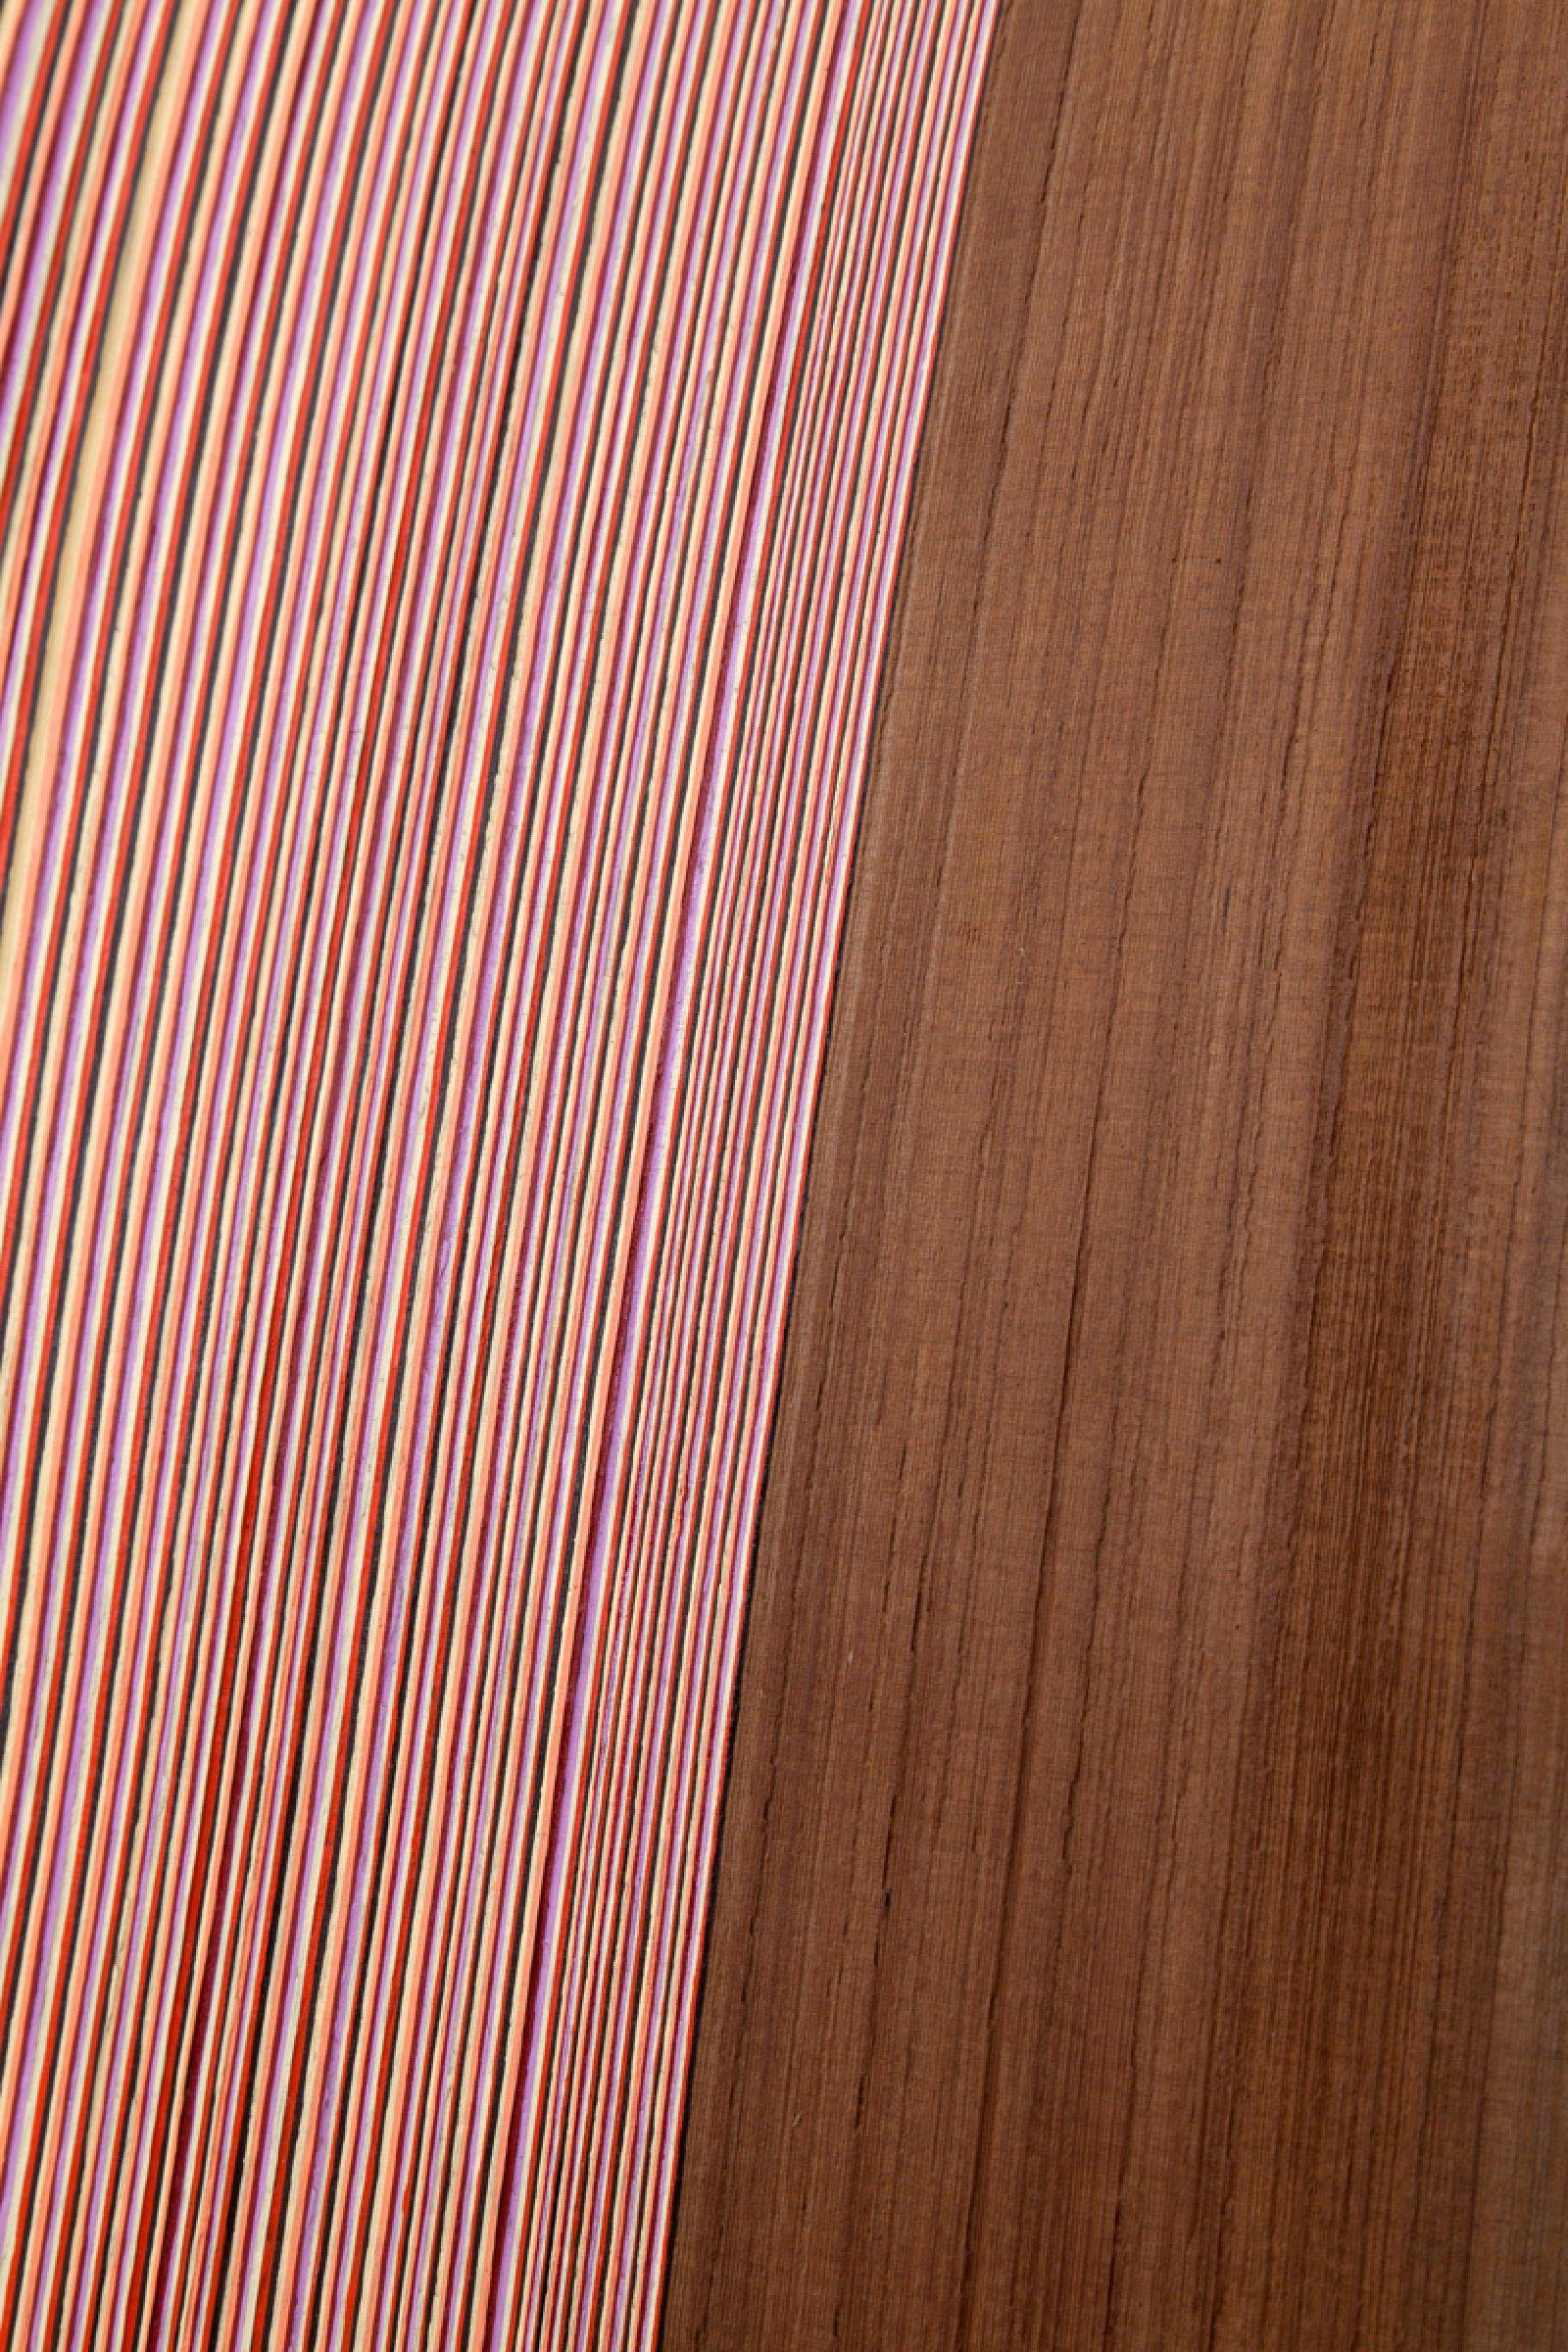 Brian Jungen,Shake (detail), 2014, cedar, alkyd-resin enamel, 28 x 12 x 1 in. (70 x 29 x 2 cm)